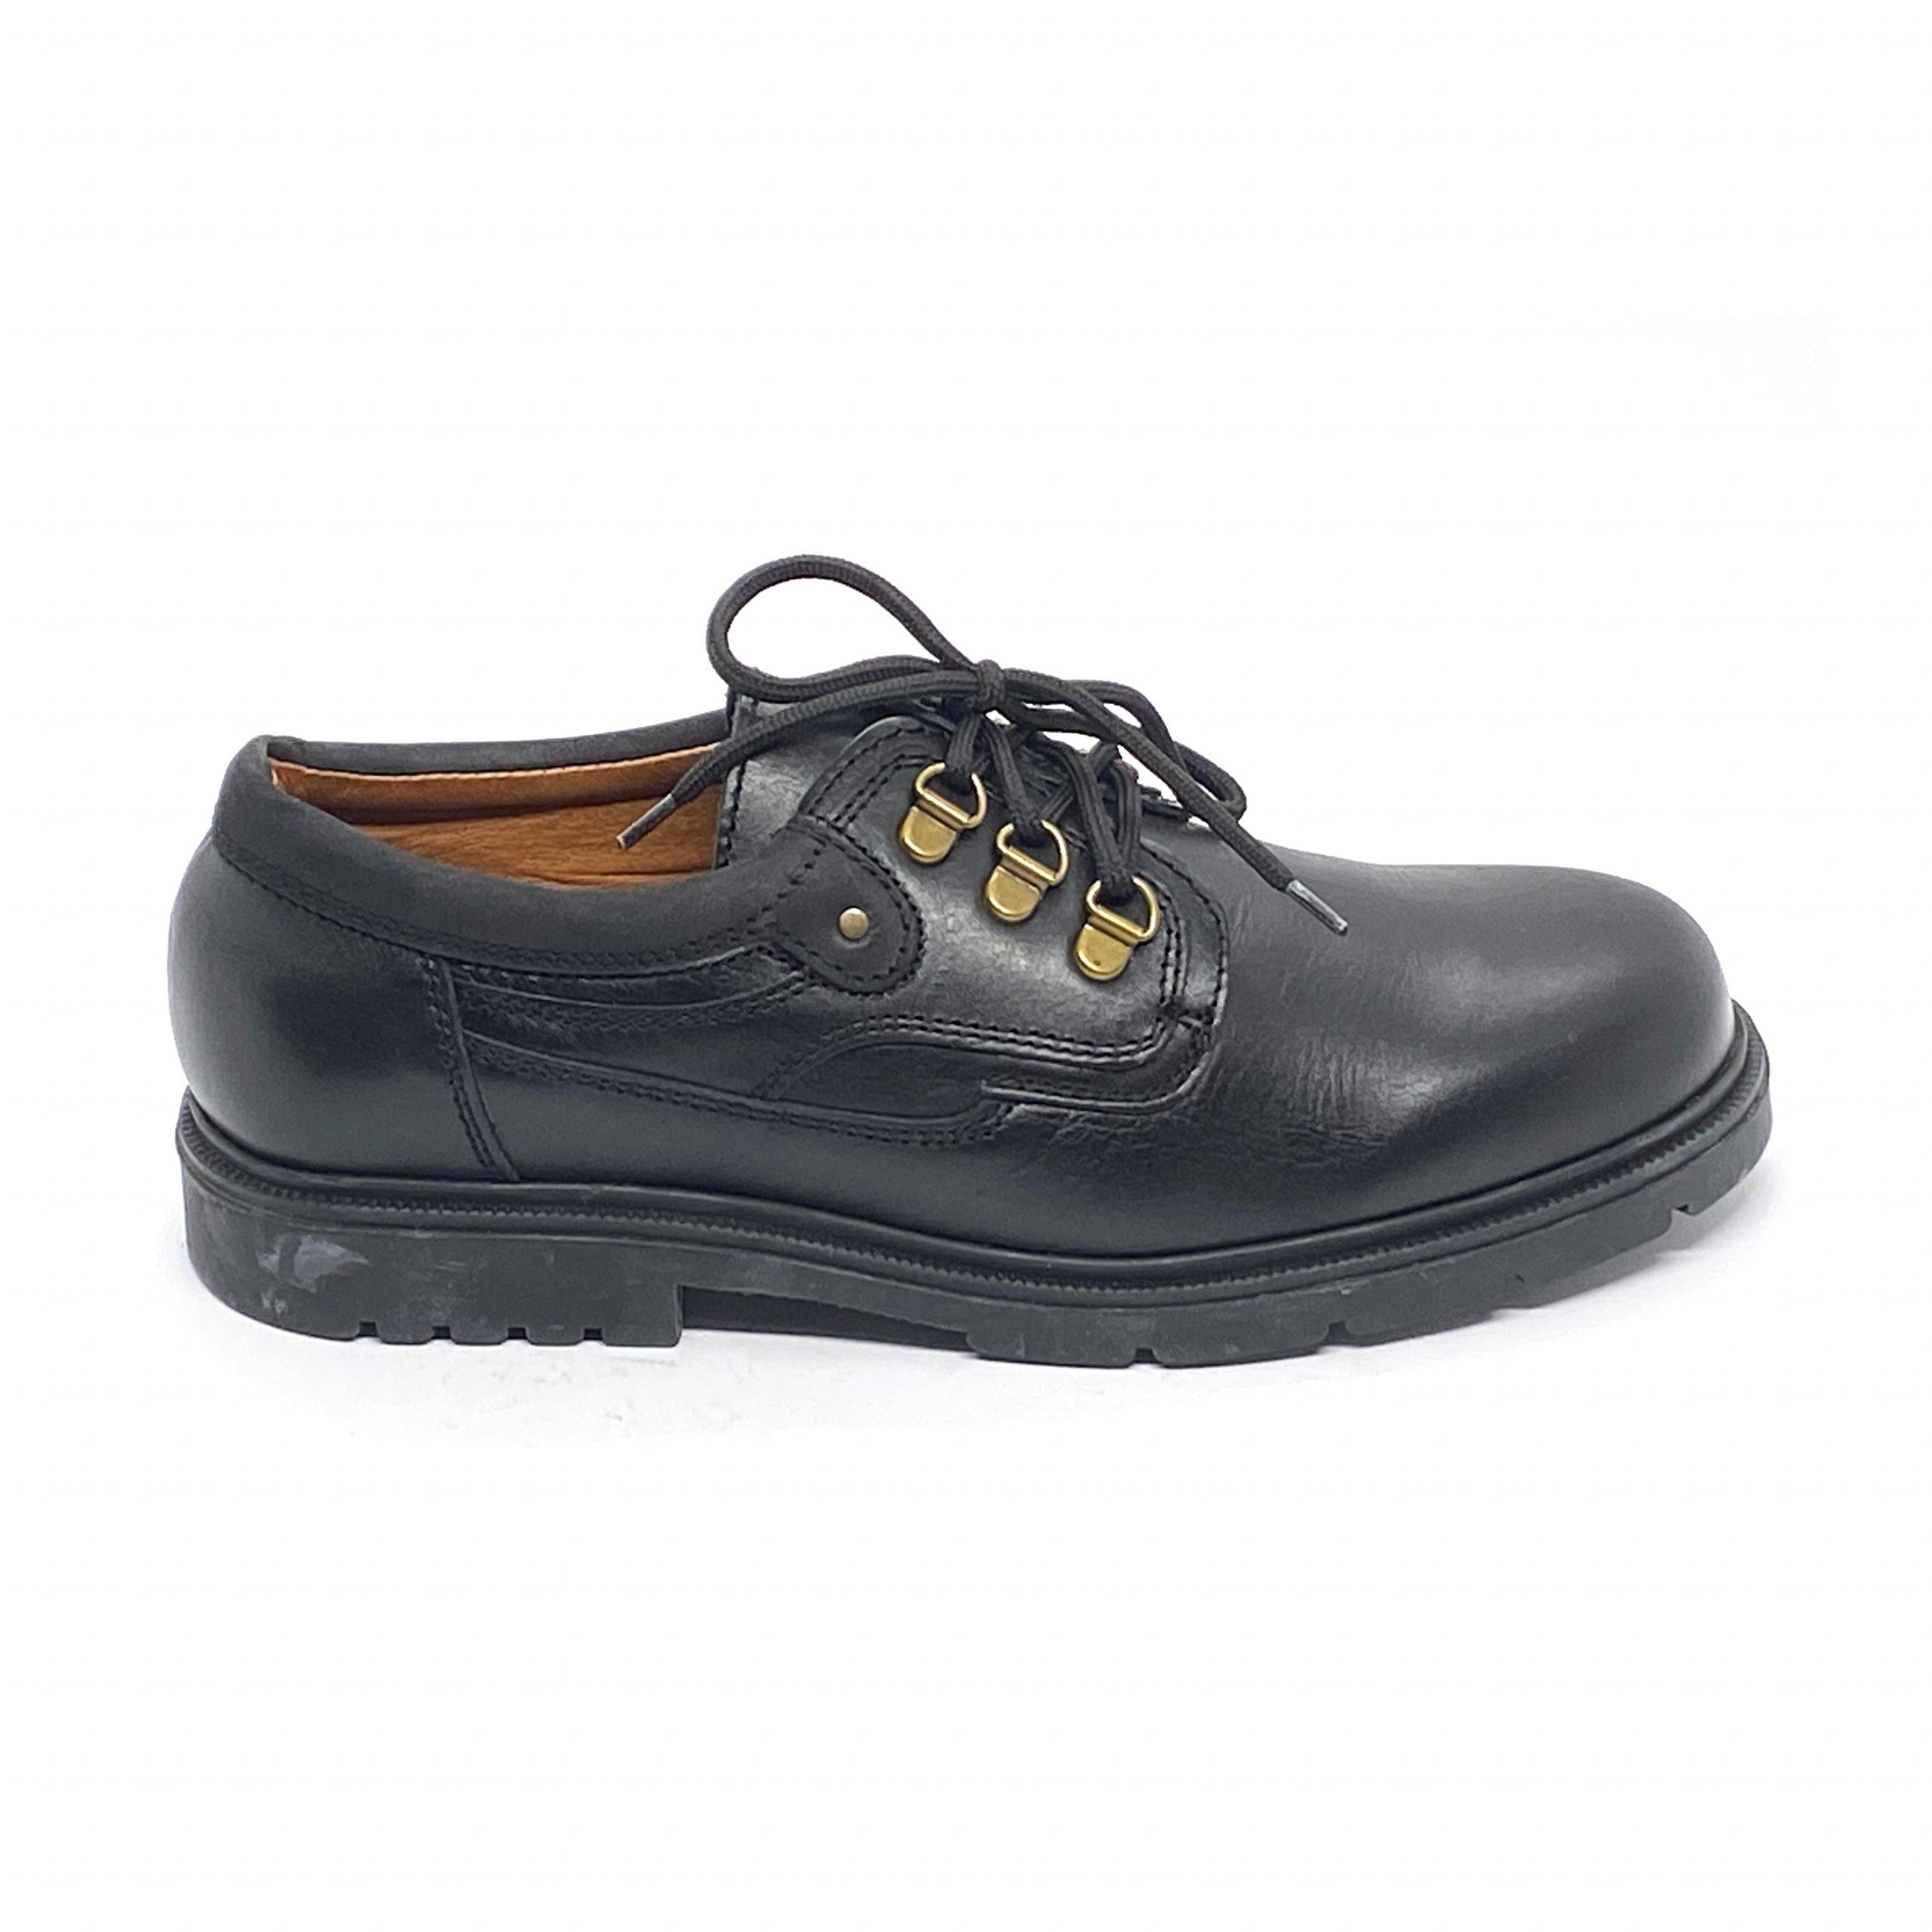 Zapato clásico Pablo atado